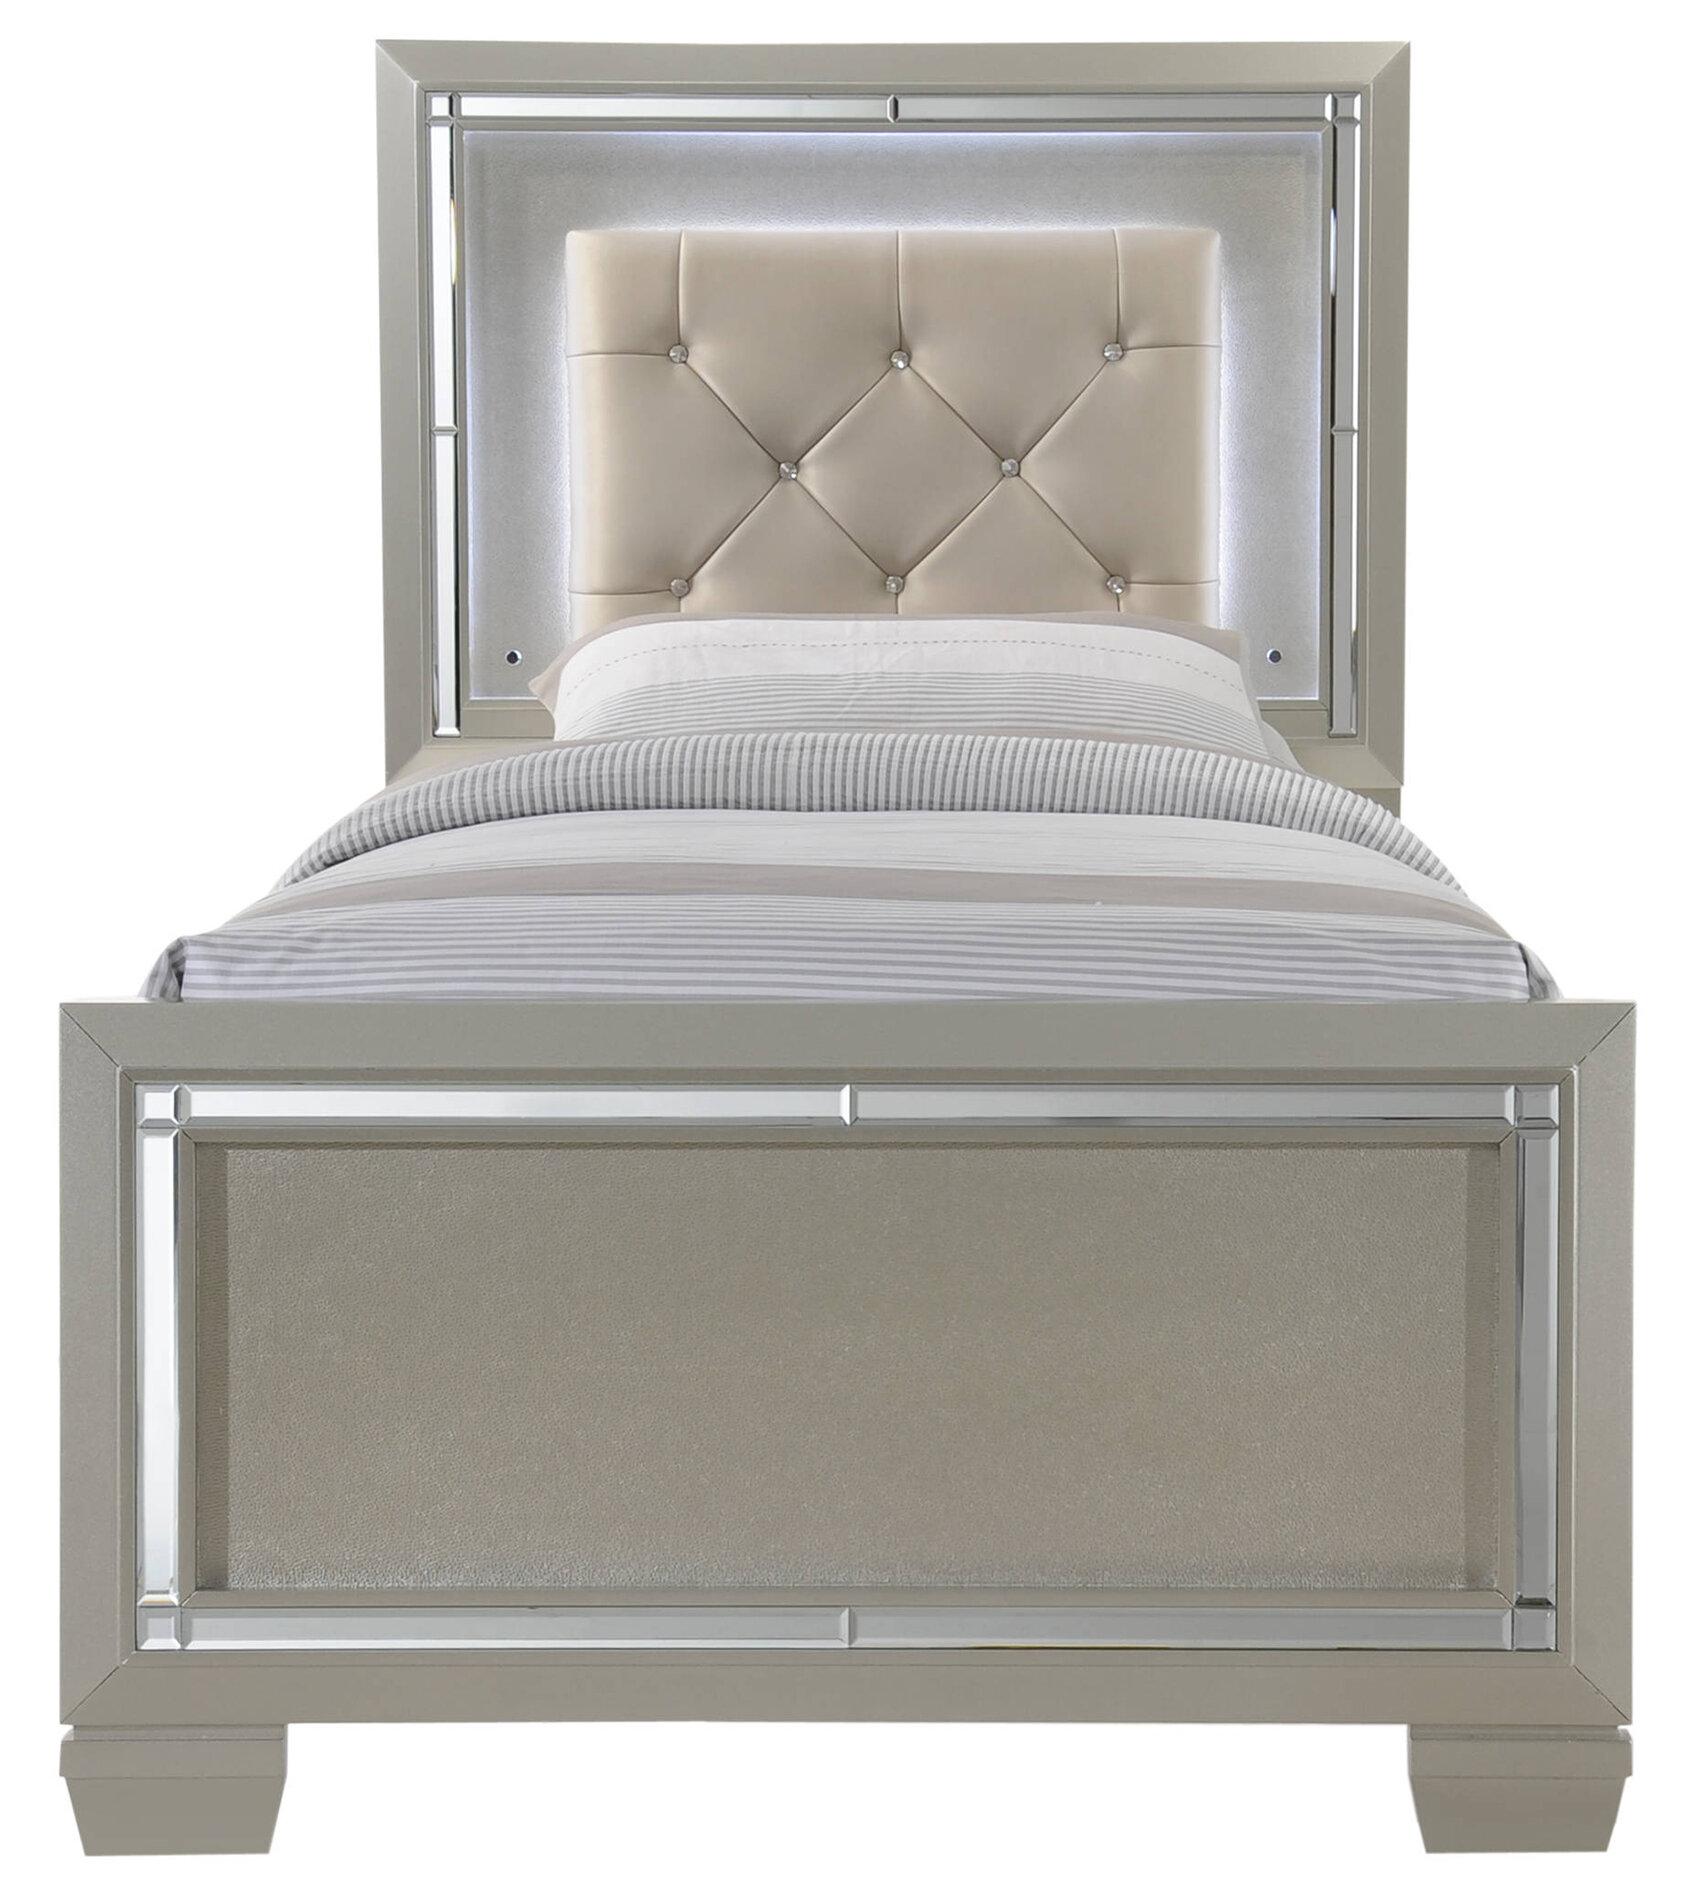 Rosdorf Park Domenick Twin Upholstered Platform Bed Frame with LED ...